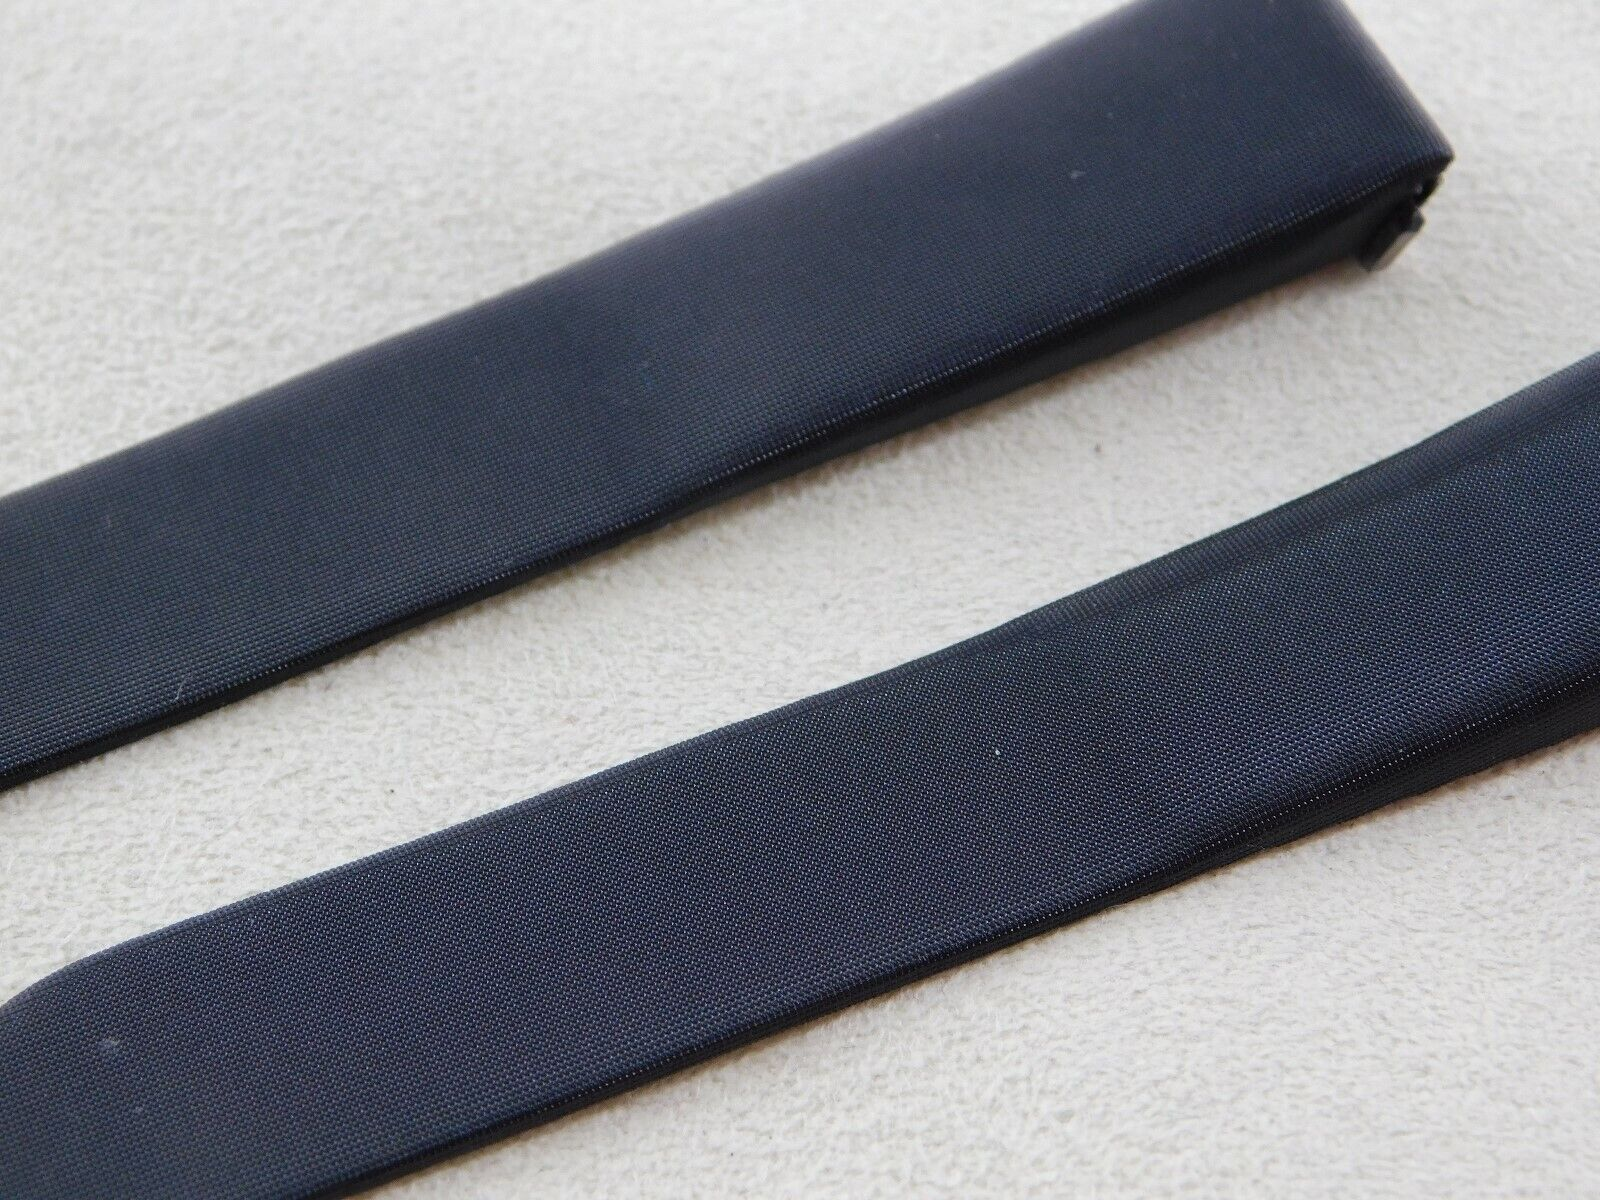 Neu Original Cartier Armband schwarz 15 - 14  Roadster Lady Satinband in OVP